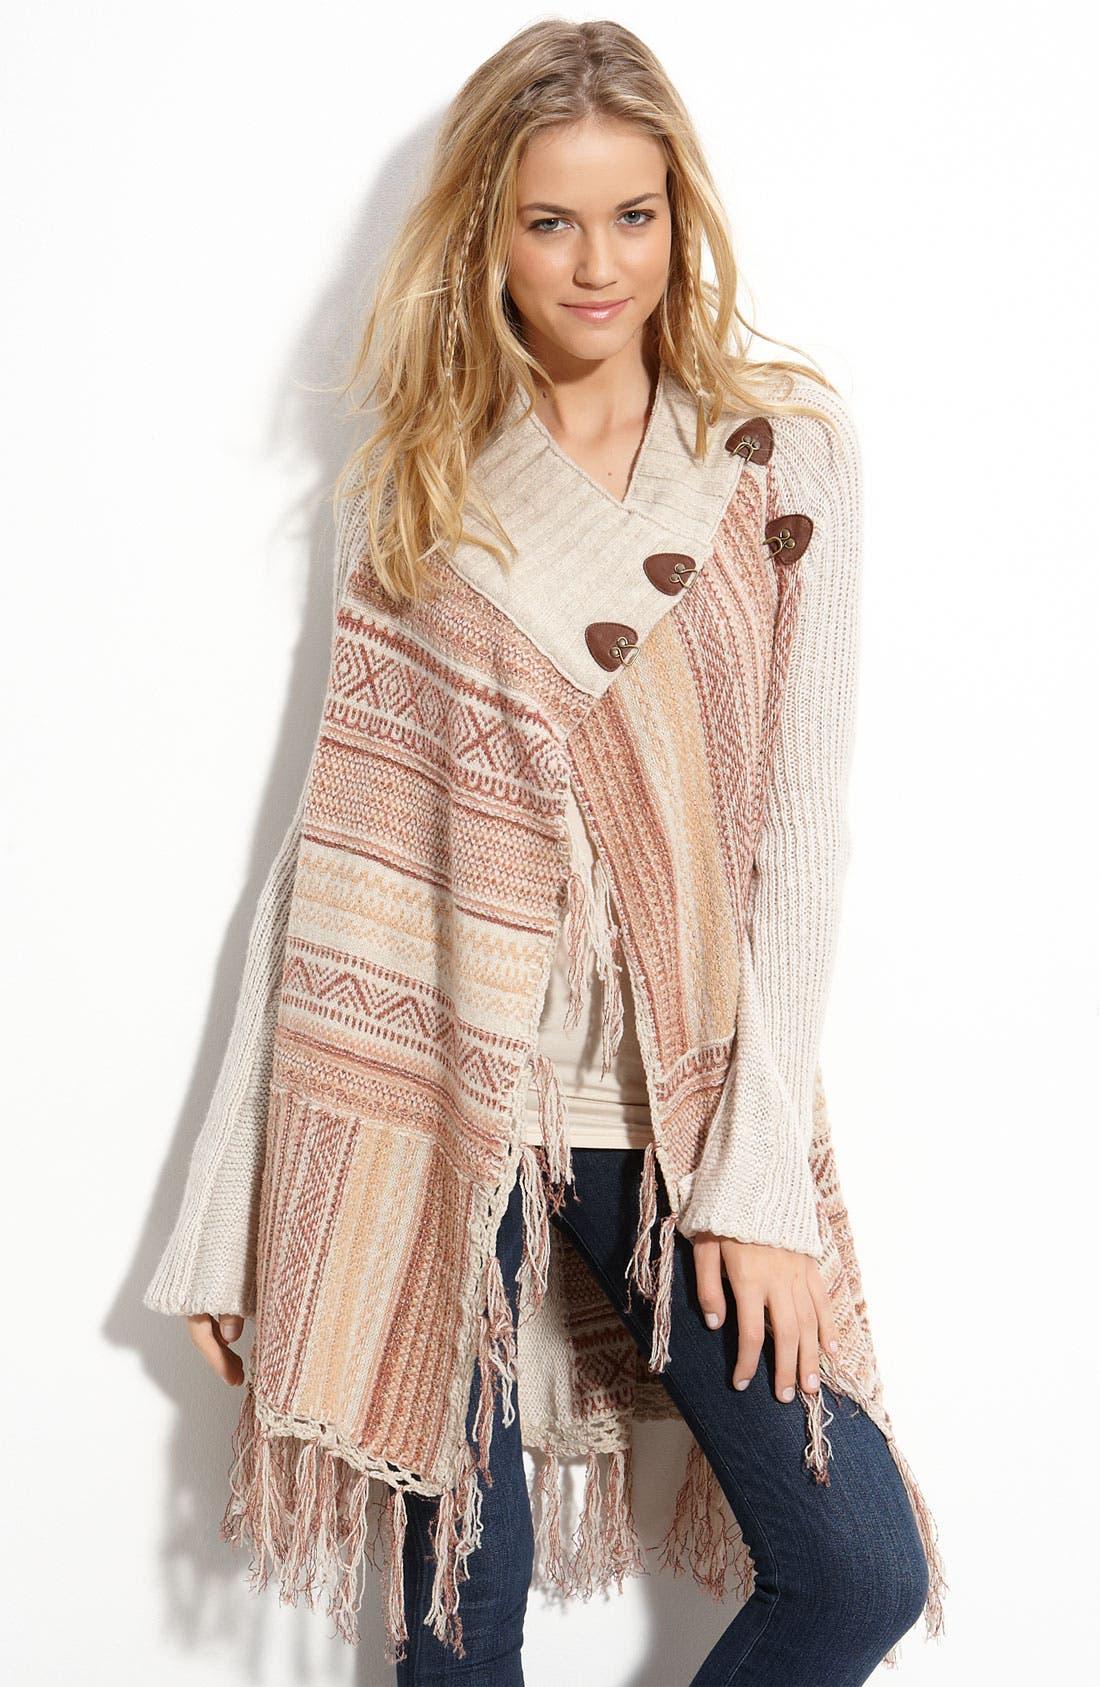 Alternate Image 1 Selected - Free People 'Maple Leaf' Wrap Sweater